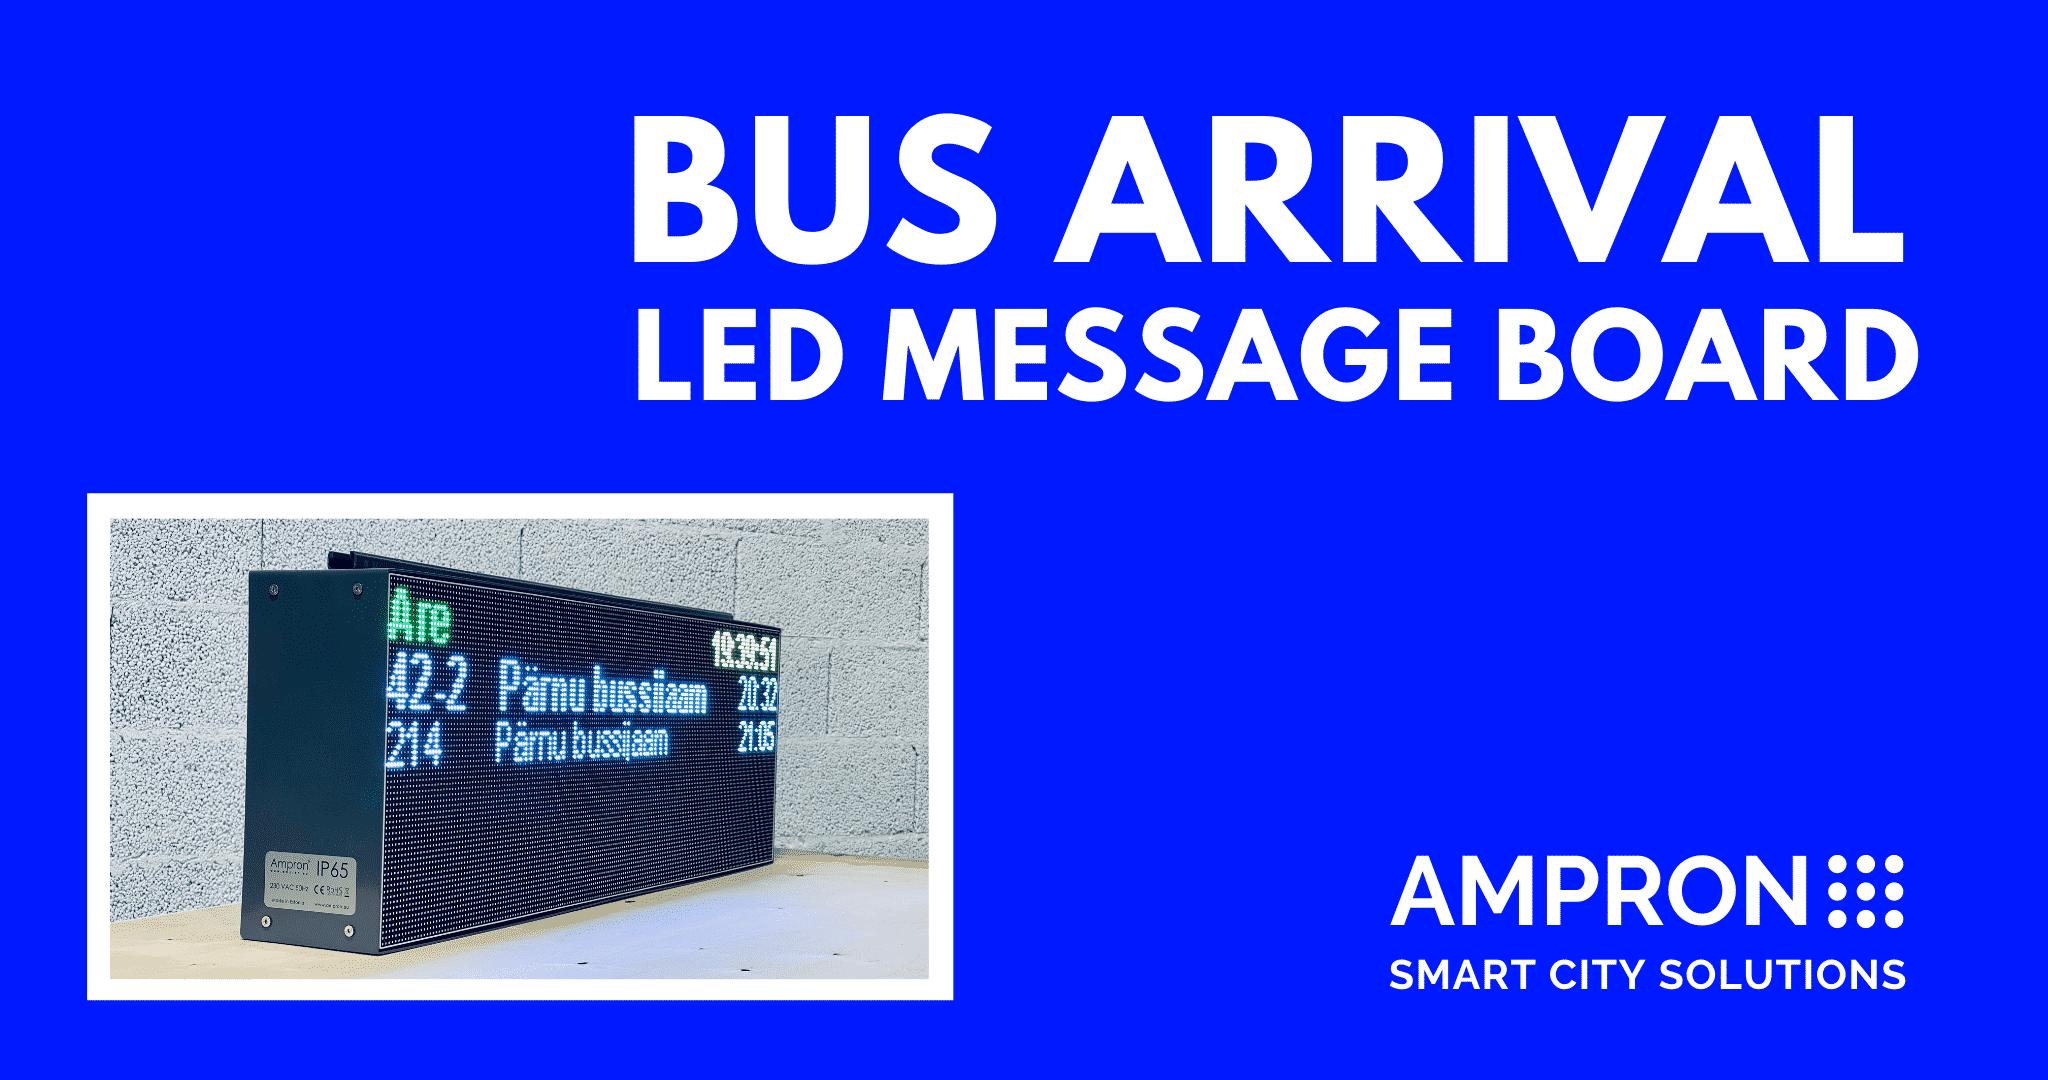 Bus Arrival Information LED Message Board